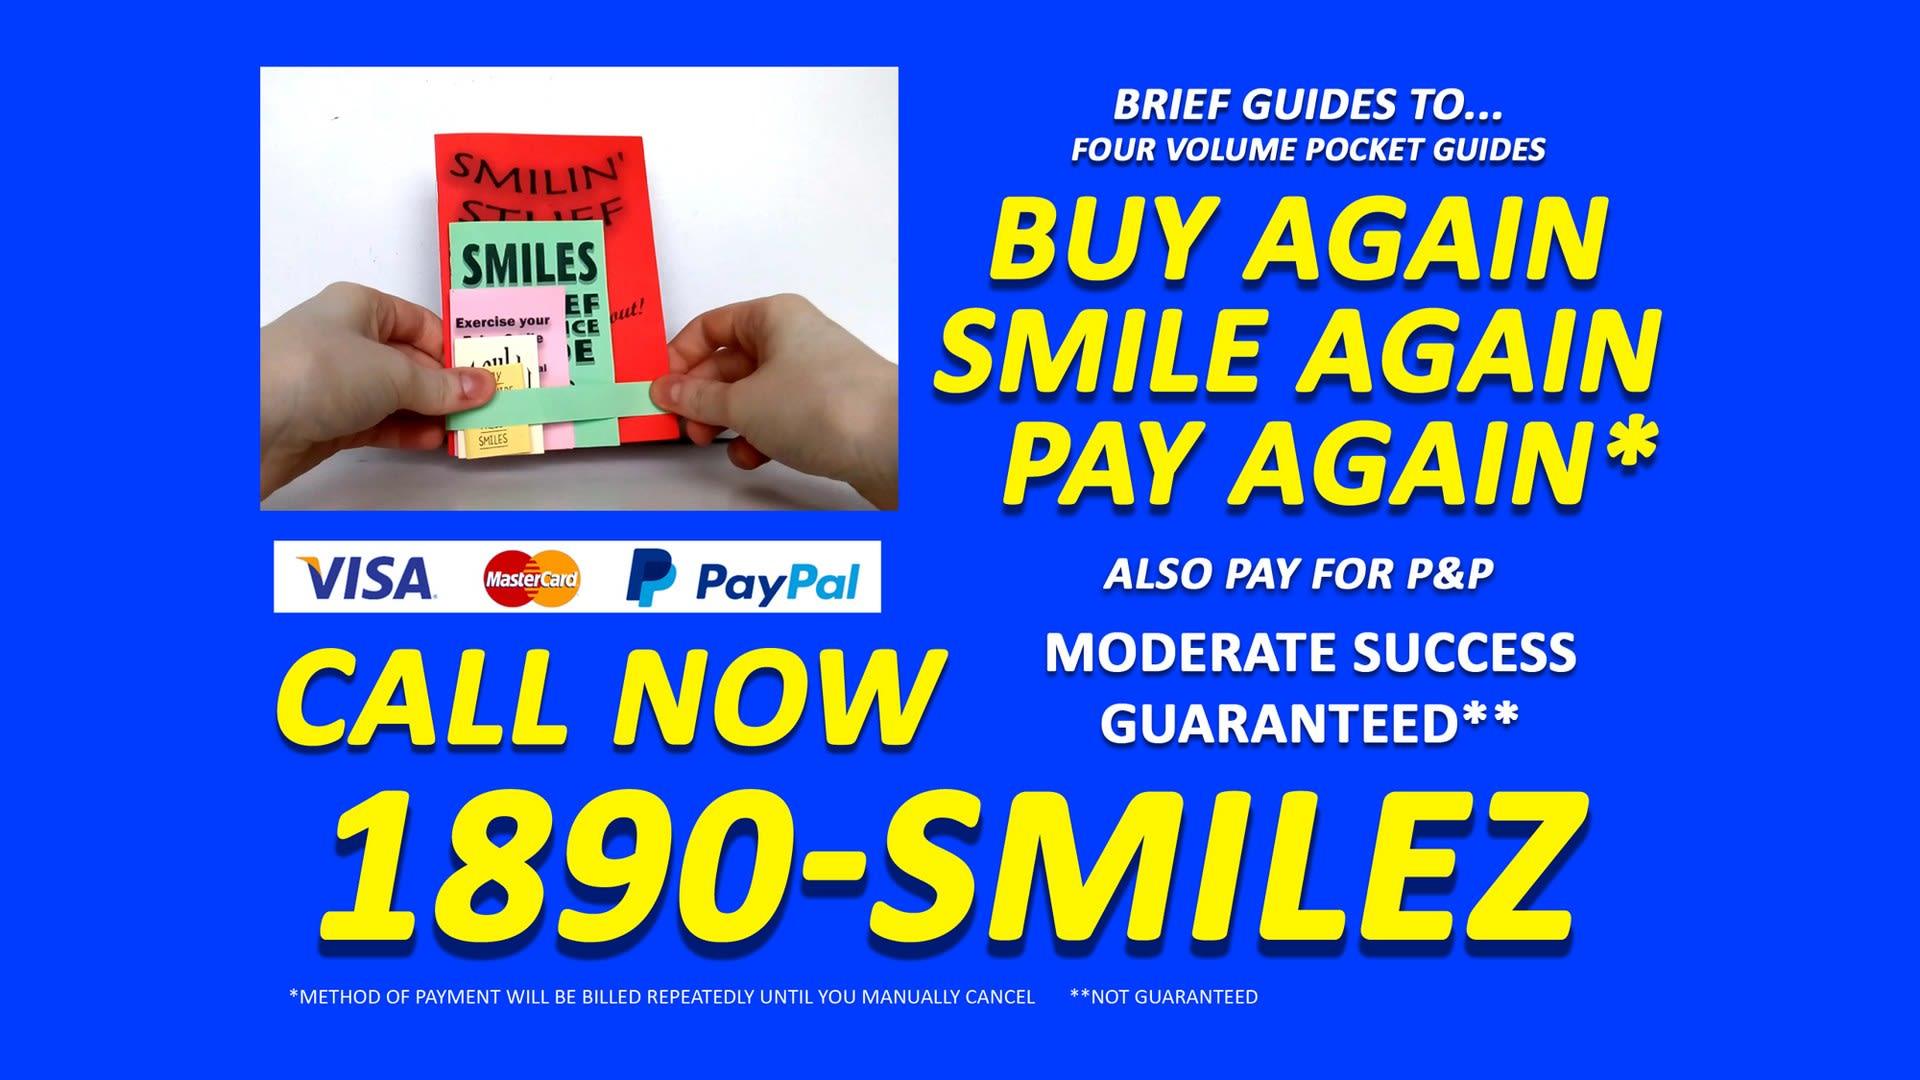 Buy Again, Smile Again, Pay Again (still)